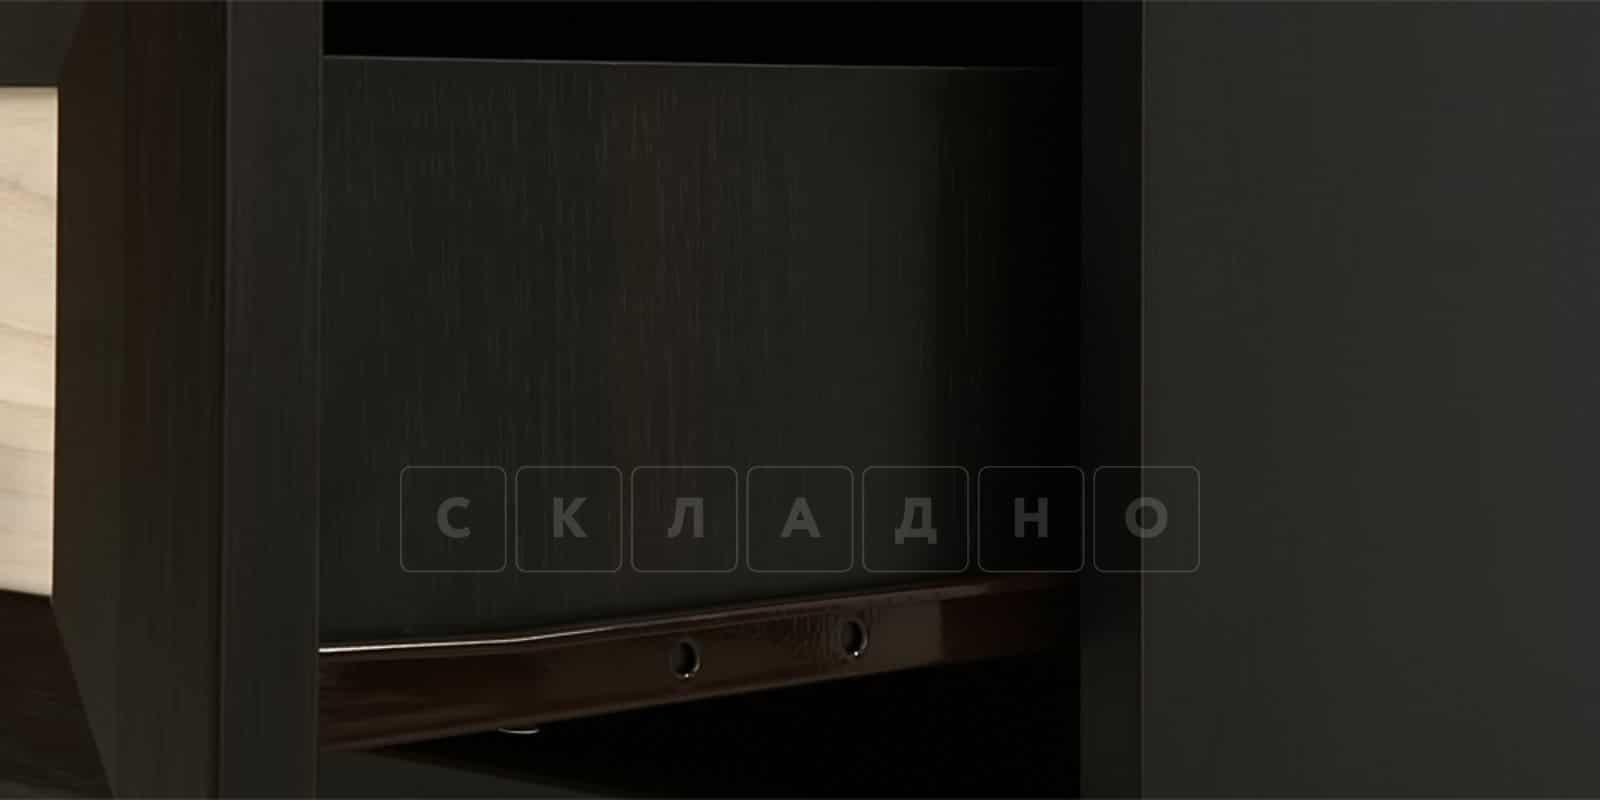 Прикроватная тумба Юлианна фото 2 | интернет-магазин Складно